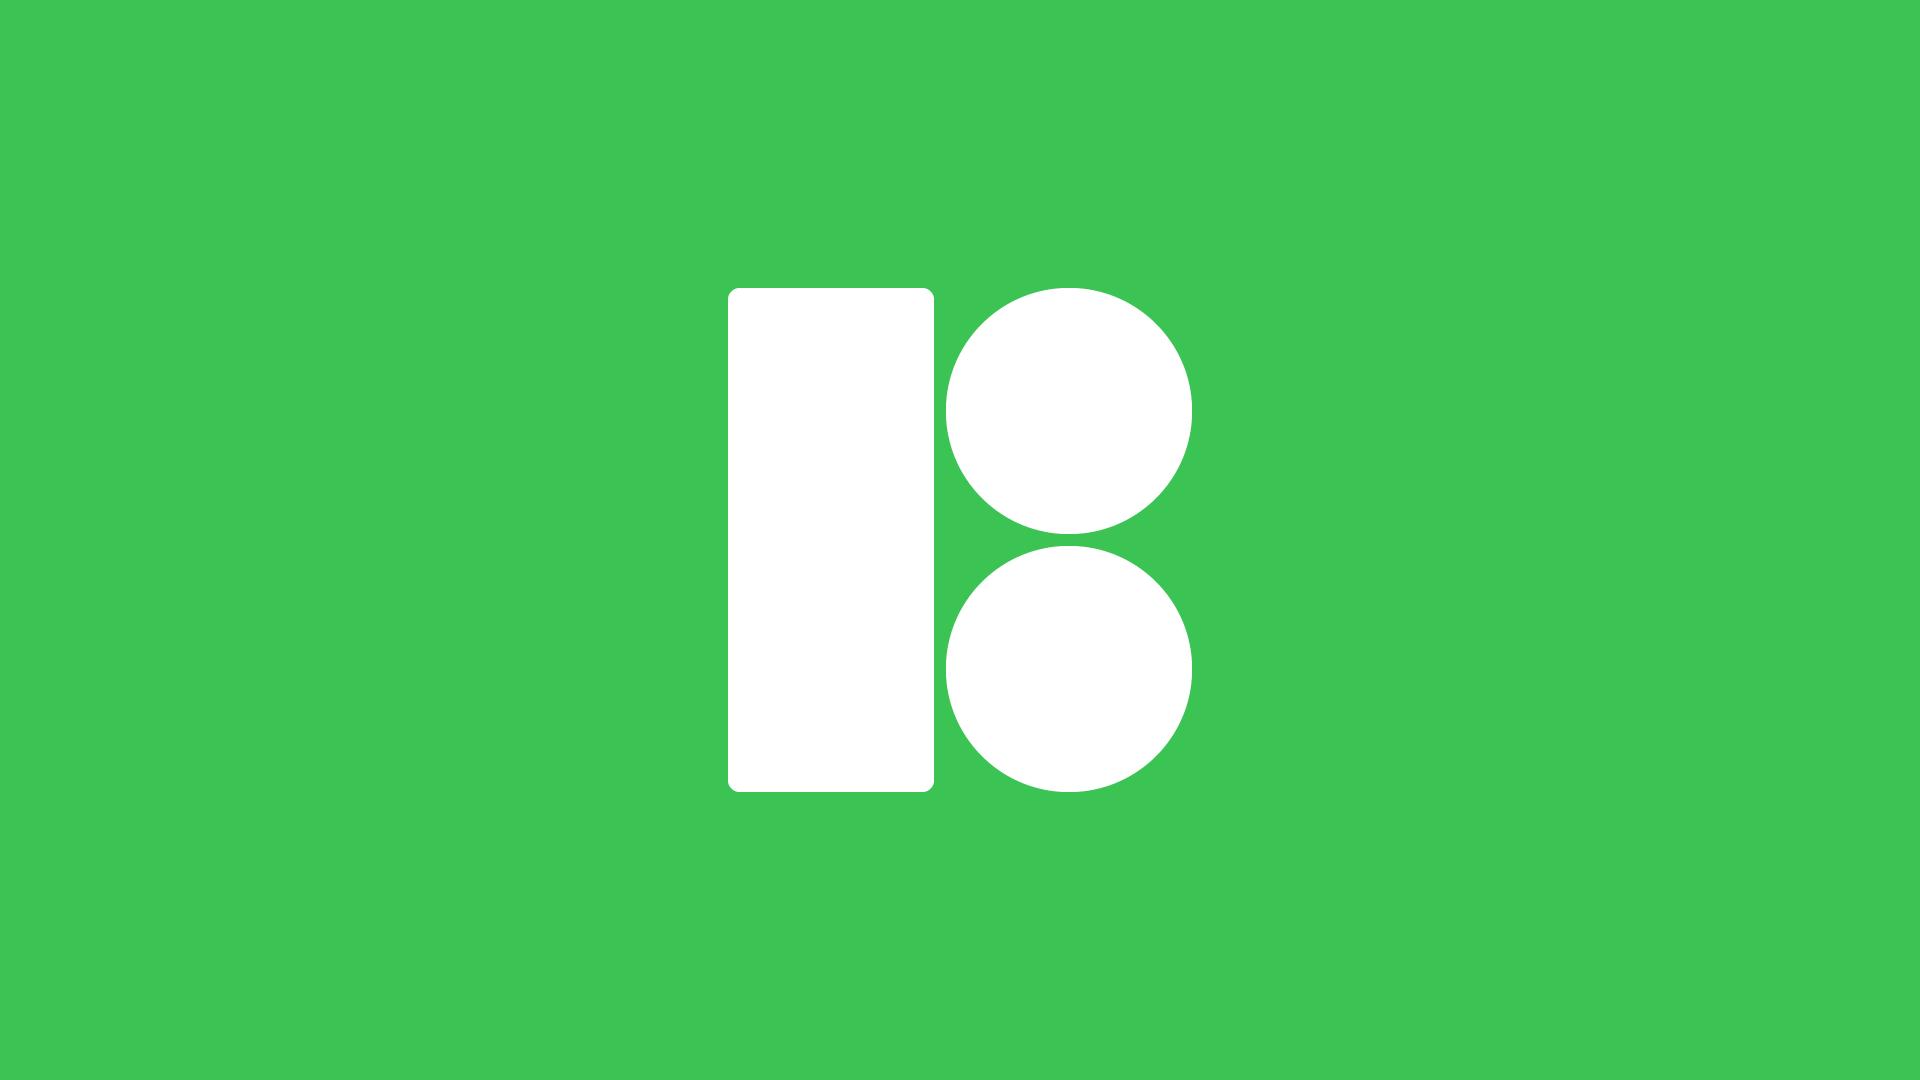 Pichon (Icons8) 8.5.0 [Ingles] [Tres Servidores] Apps.64820.13661098843479326.b89046f2-0a82-47c5-8698-49e7580fa2b0